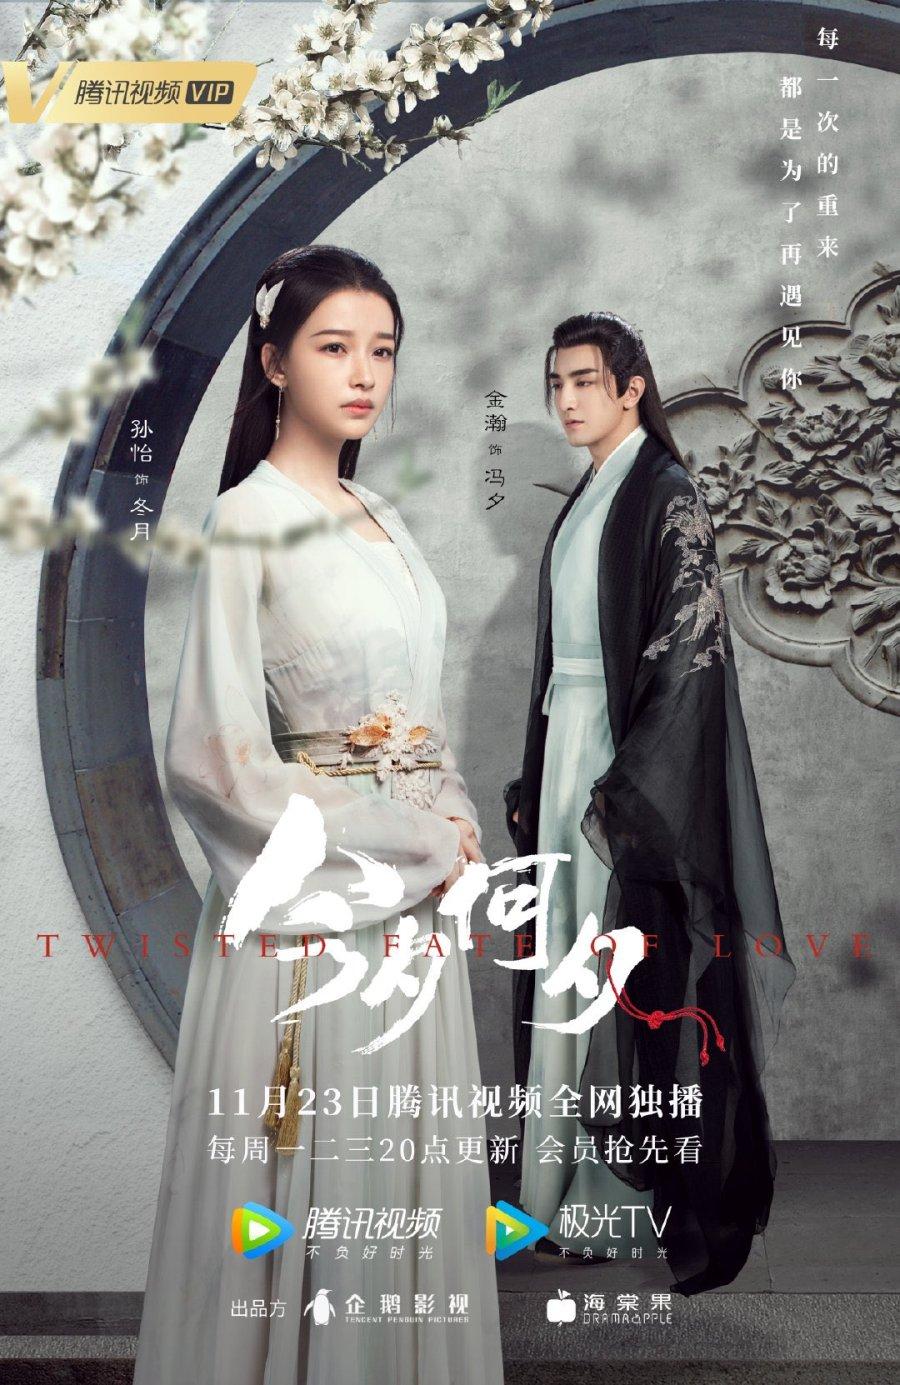 twisted-fate-of-love-ภพรักภพพราก-ซับไทย-ep-1-43